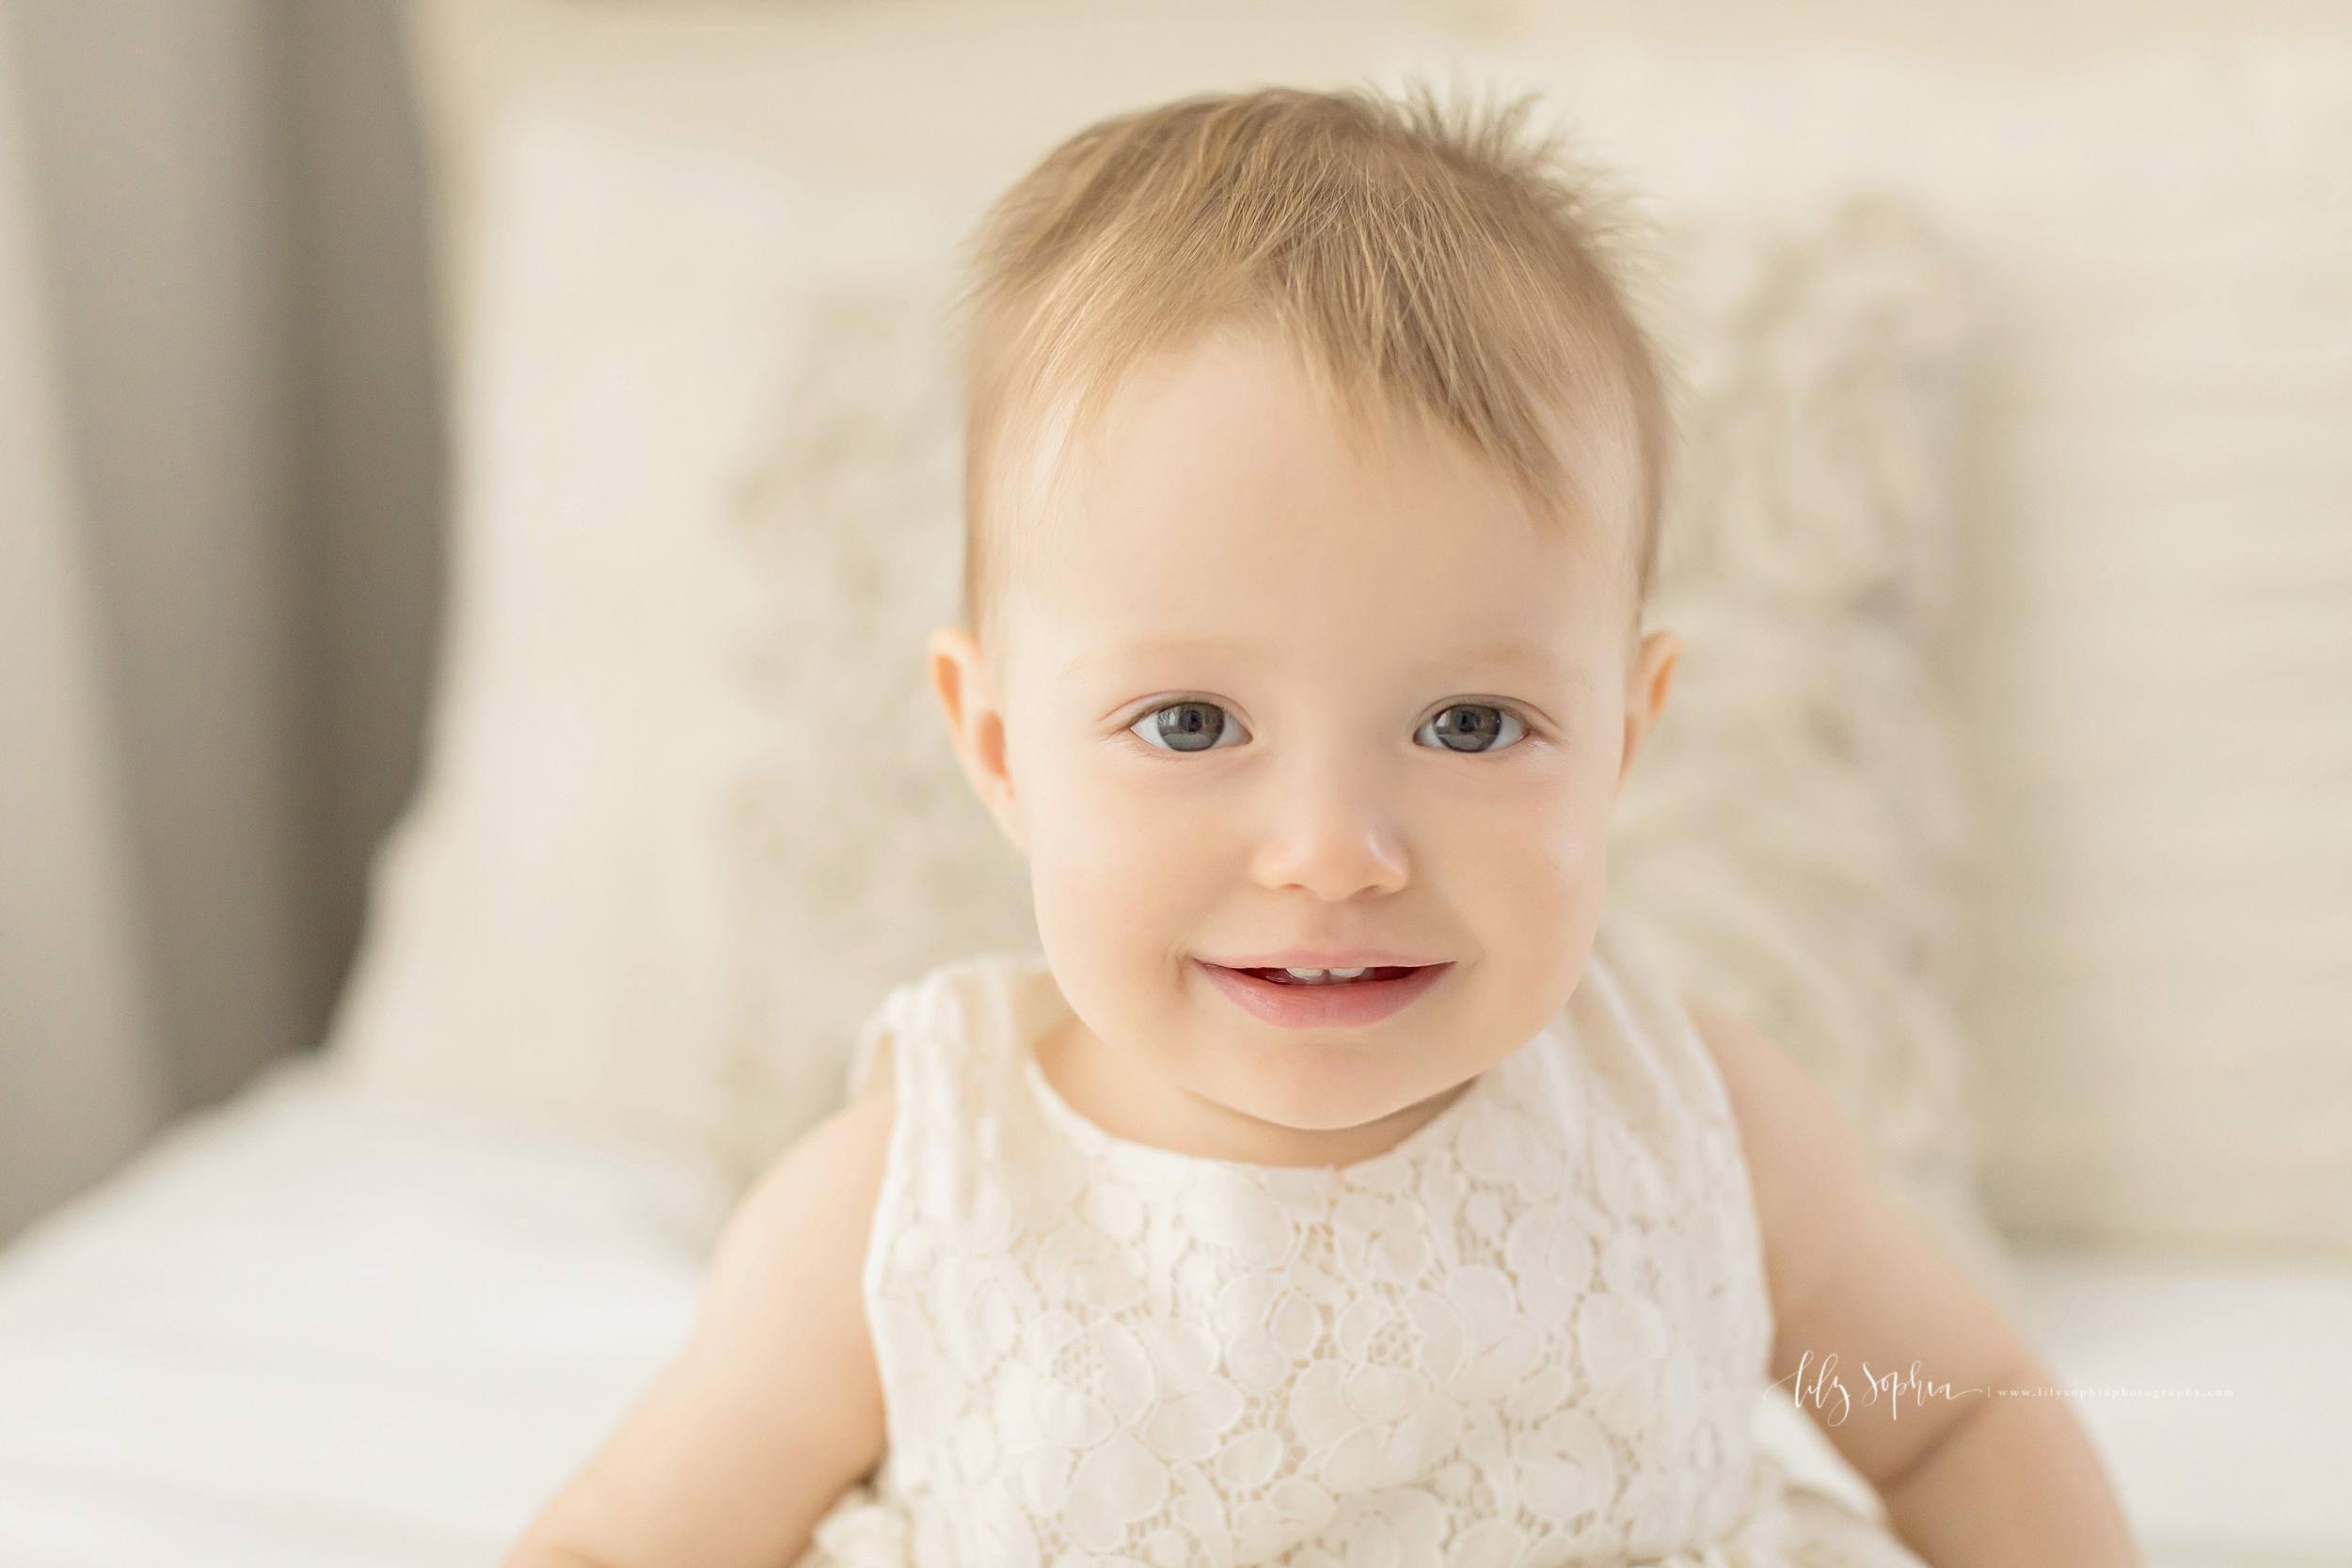 atlanta-midtown-sandy-springs-decatur-lily-sophia-photography-photographer-first-birthday-cake-smash-baby-girl_0202.jpg